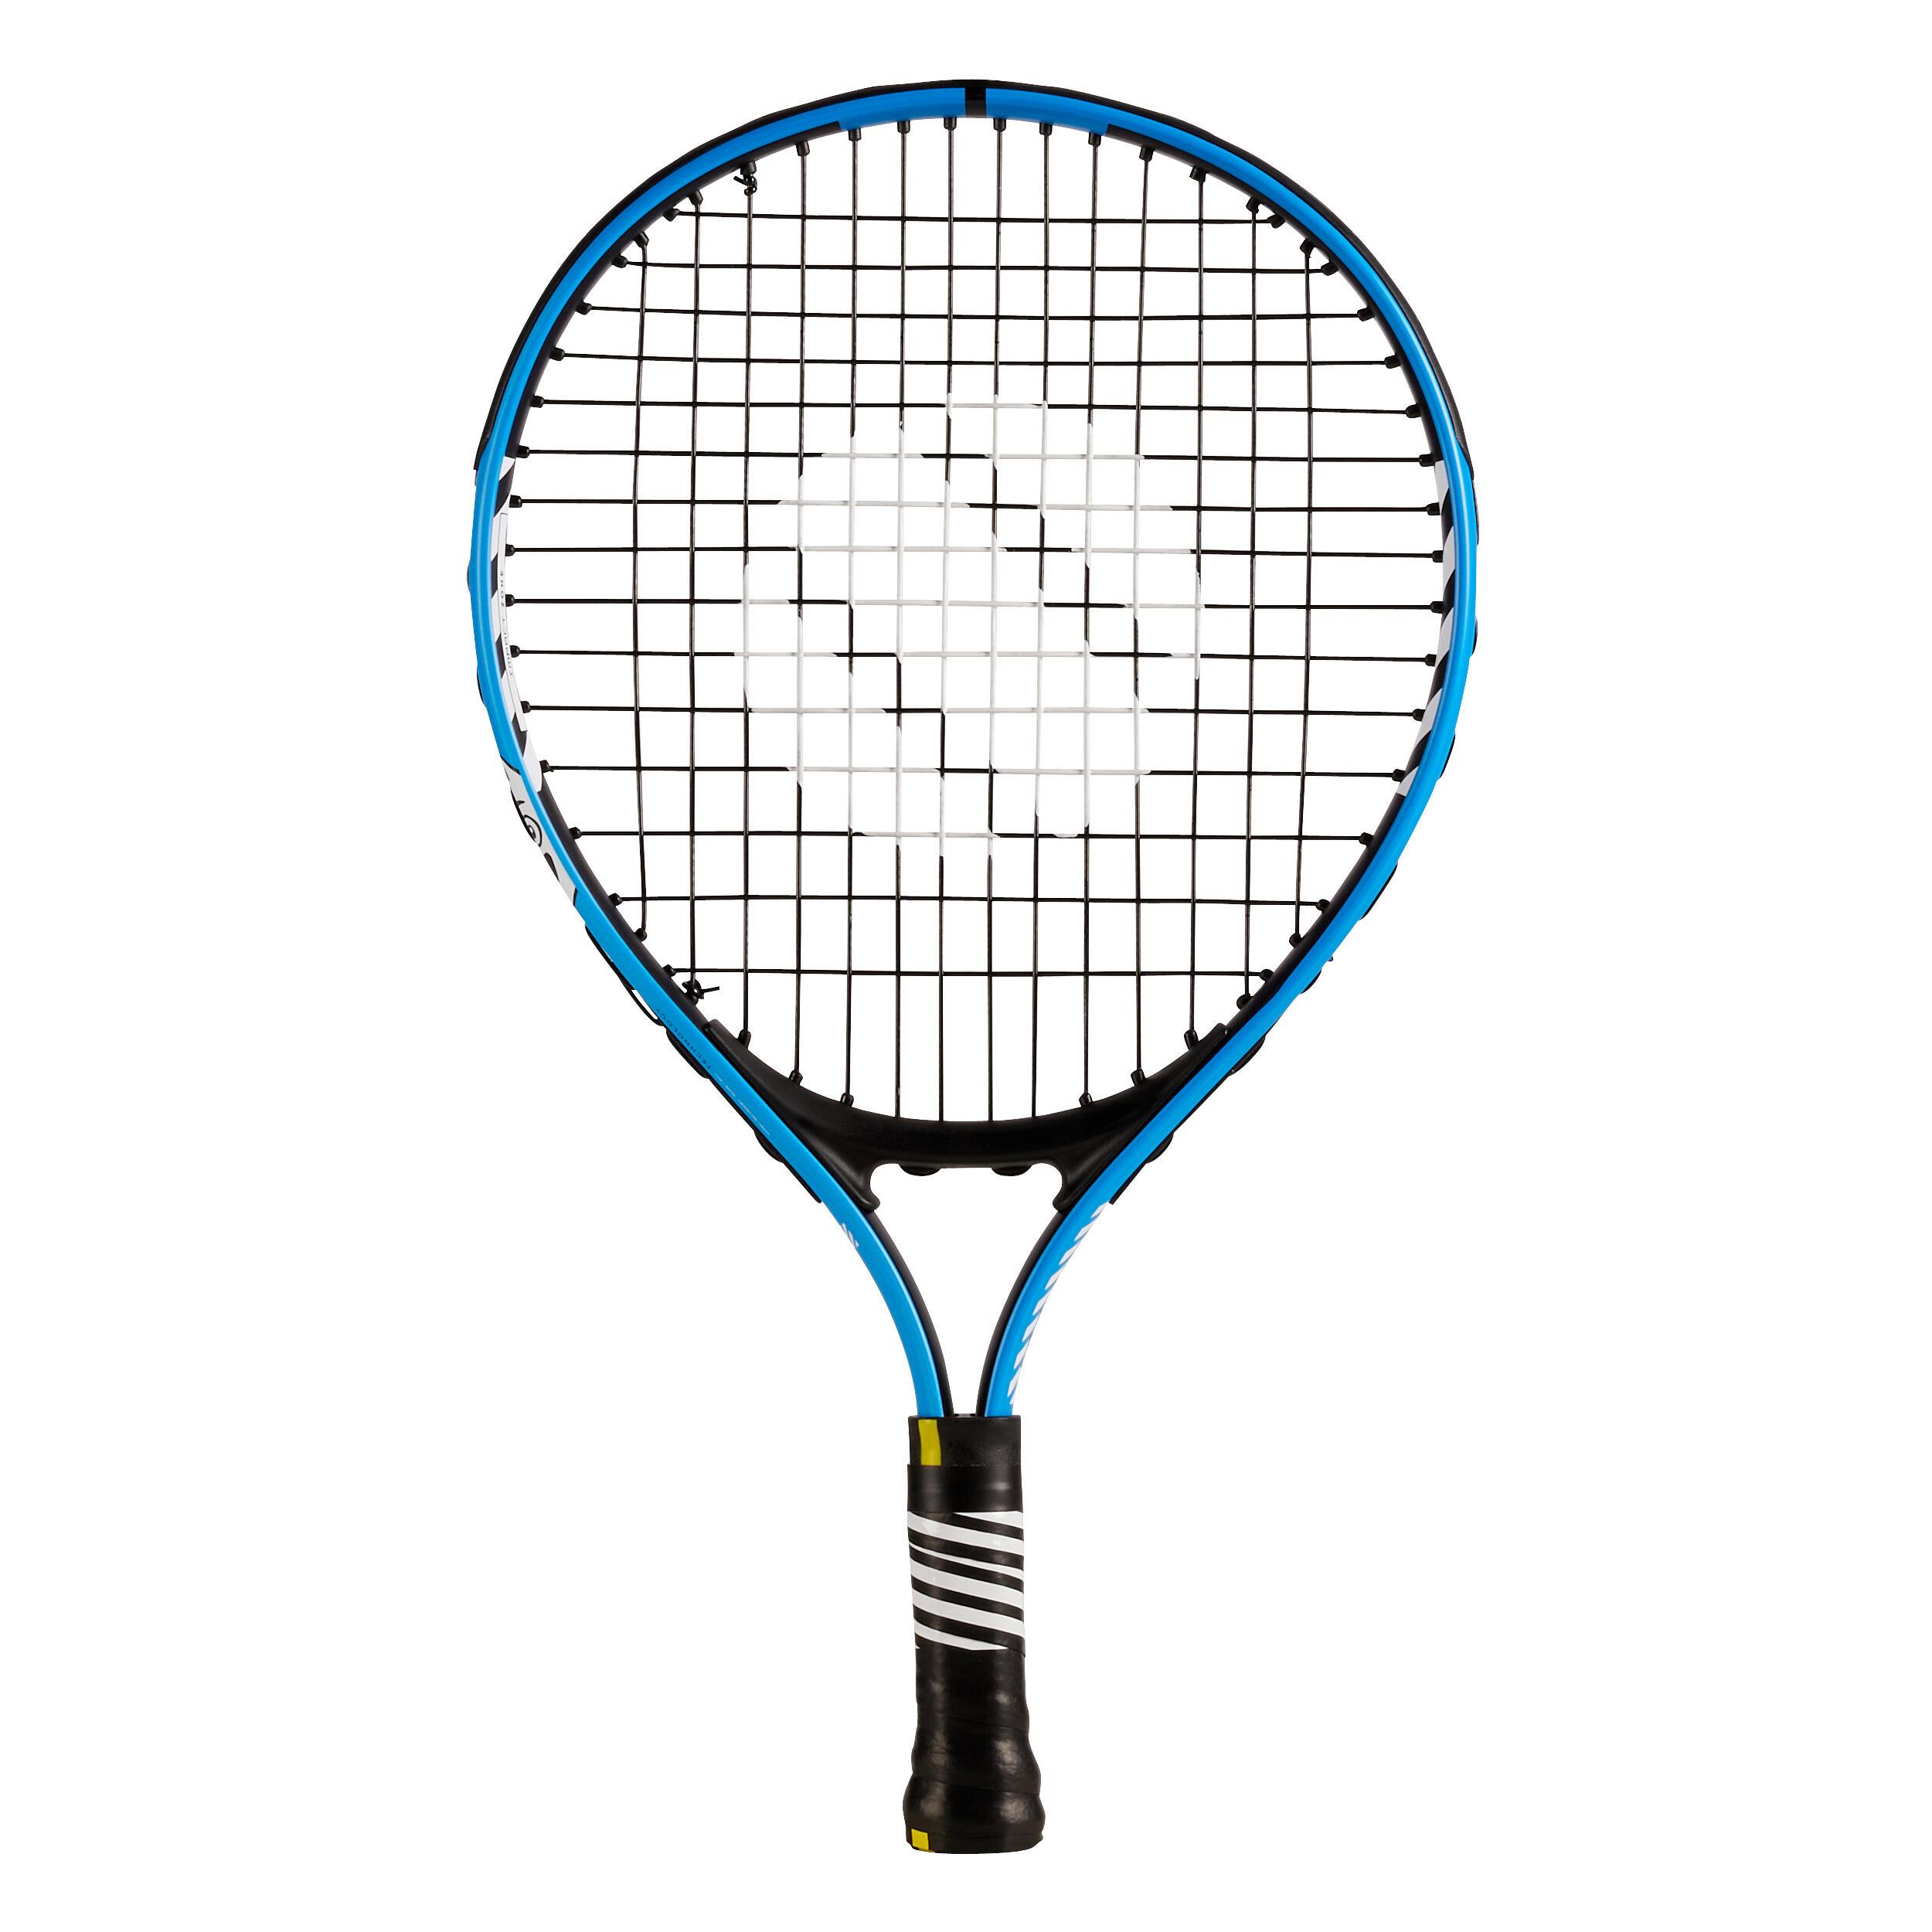 "artengo racchetta tennis bambino tr130 17"" azzurra"